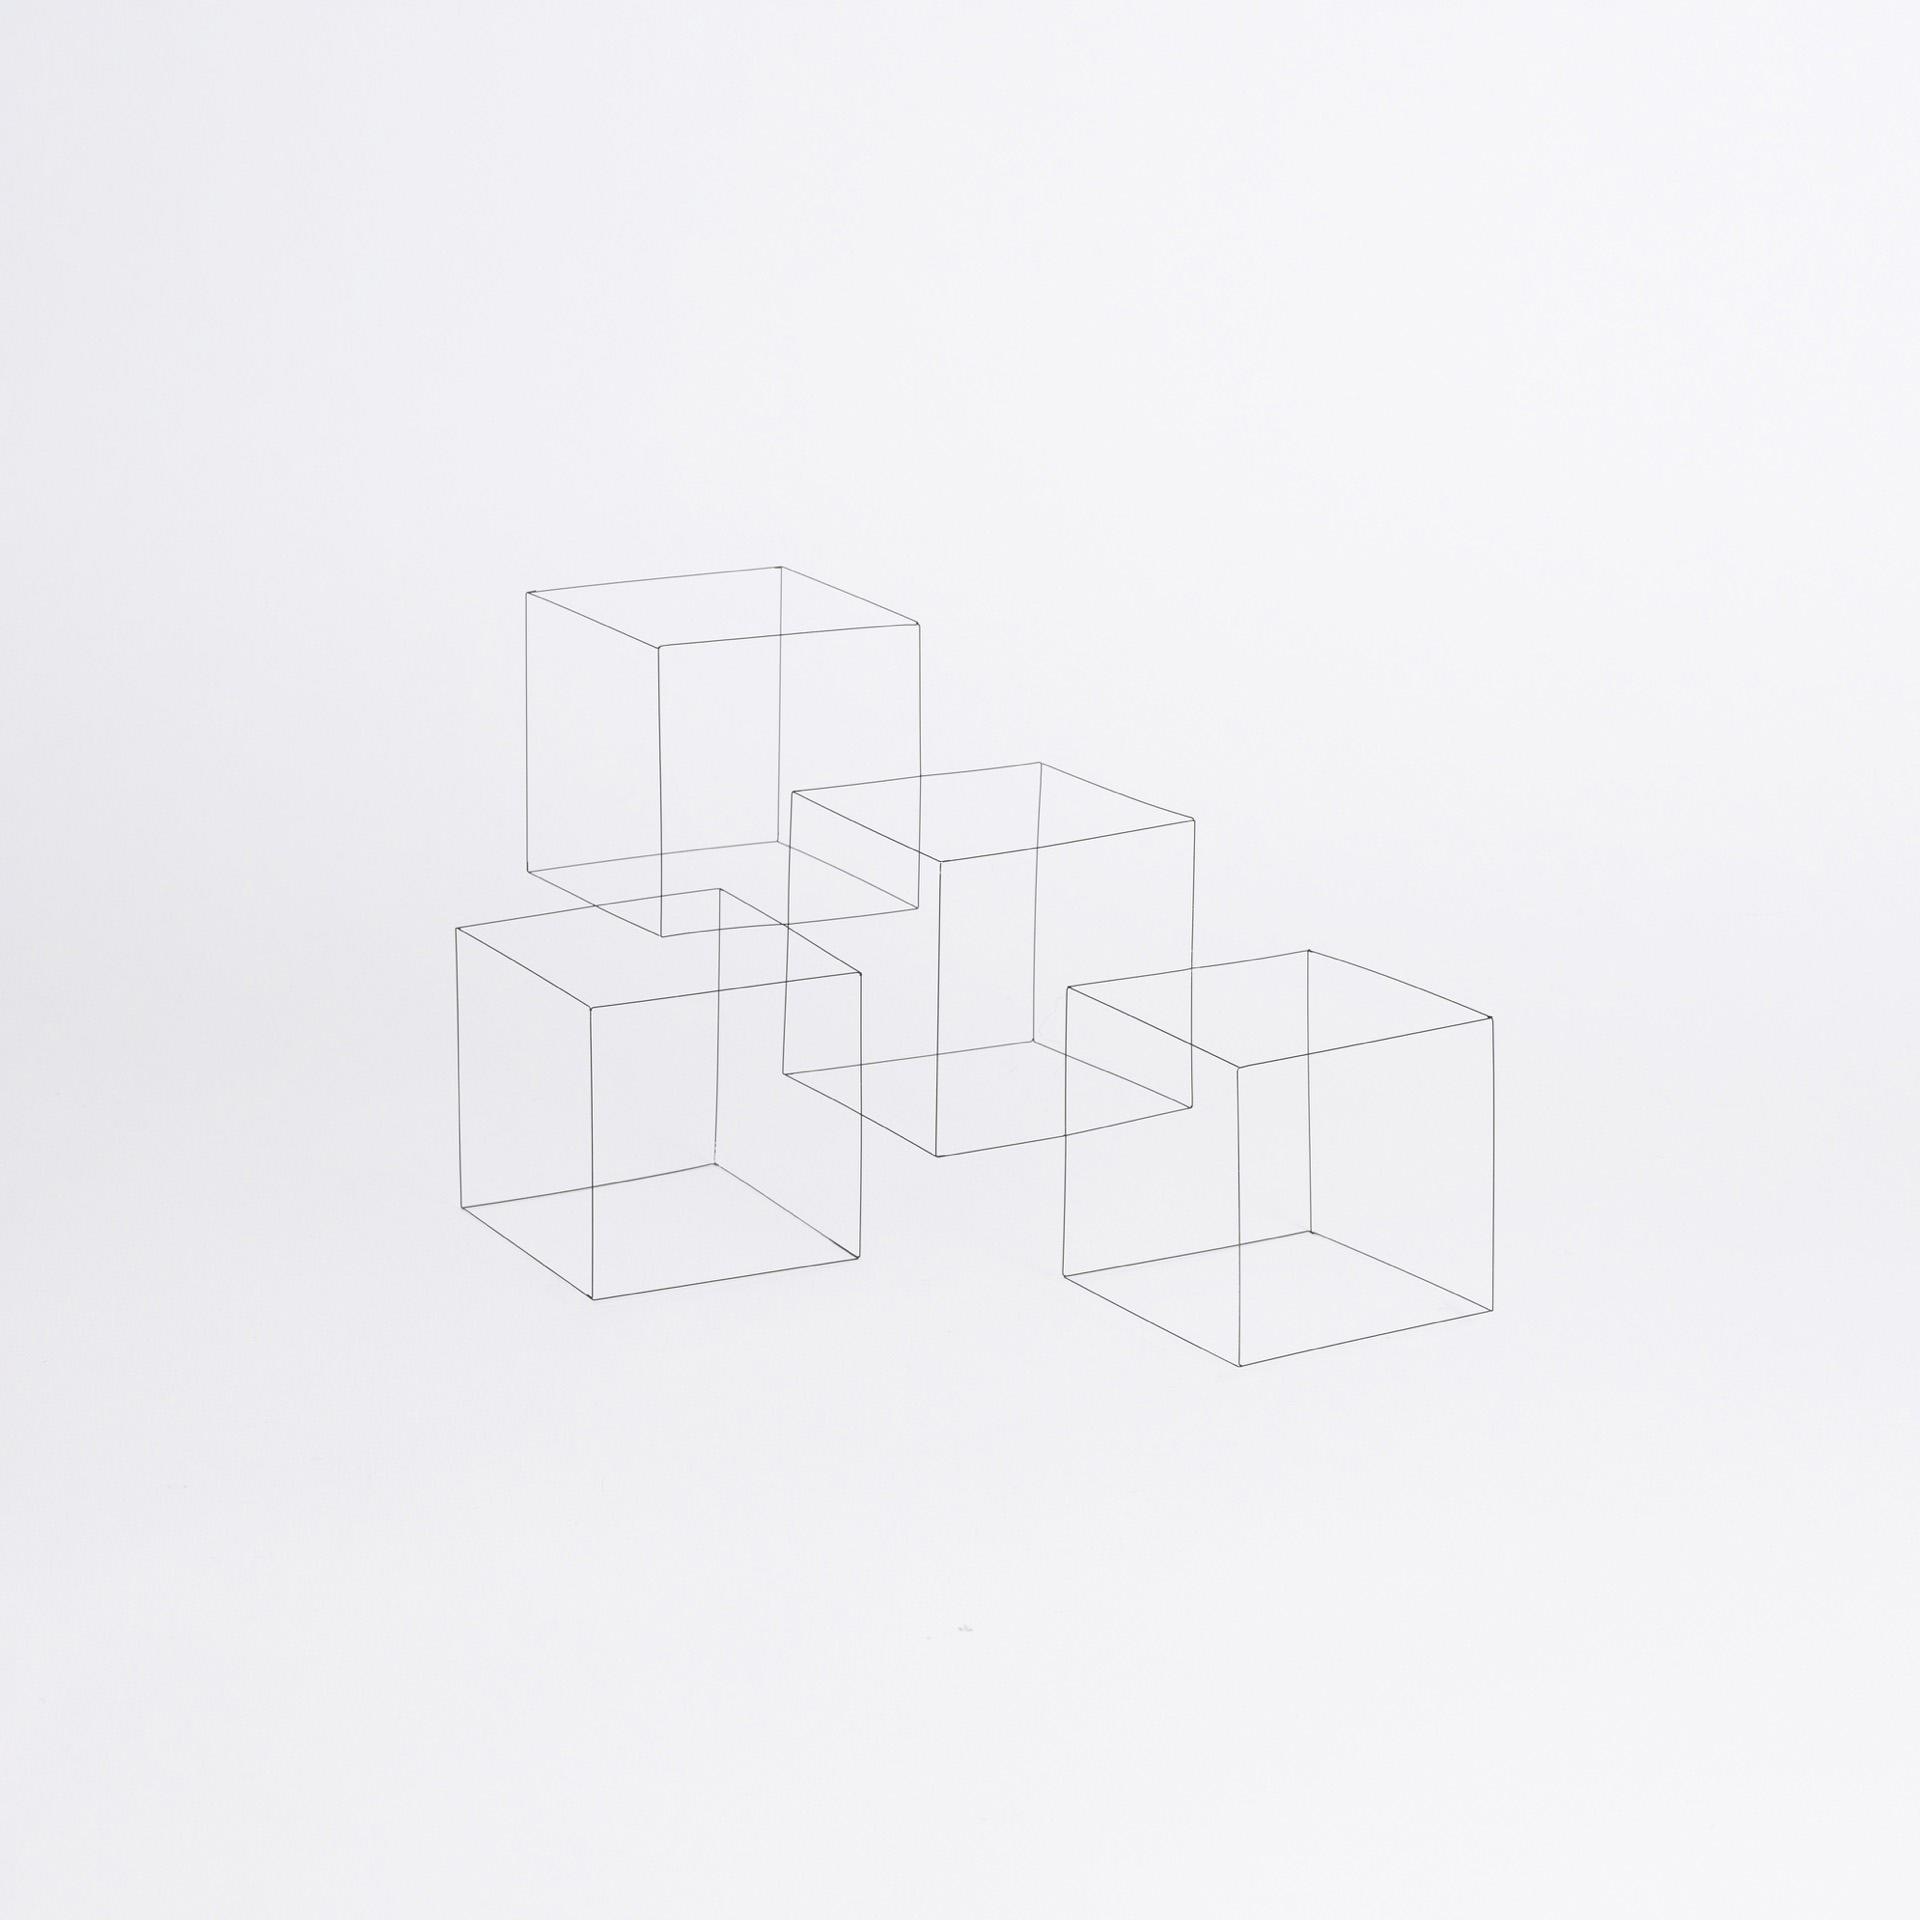 3º premio, Objetos dimensionales 2.5.